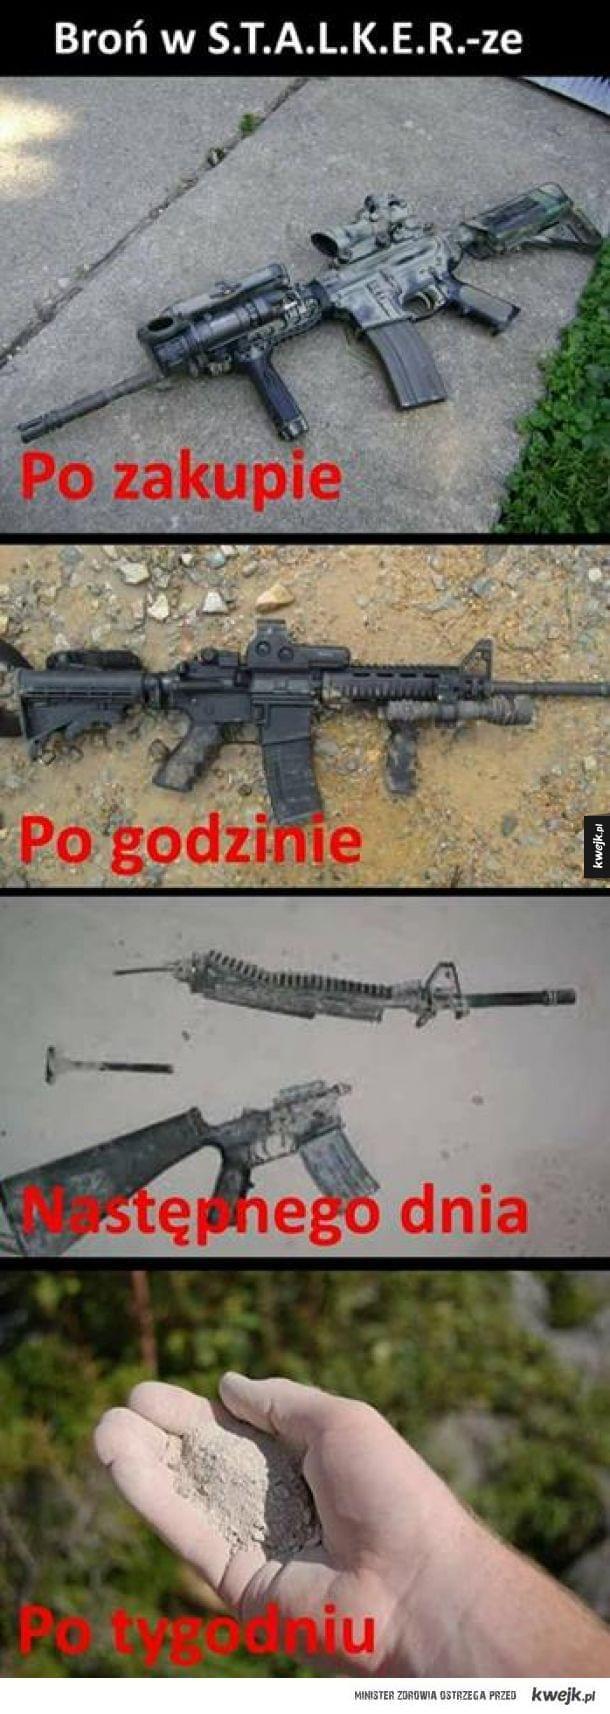 Broń w Stalkerze